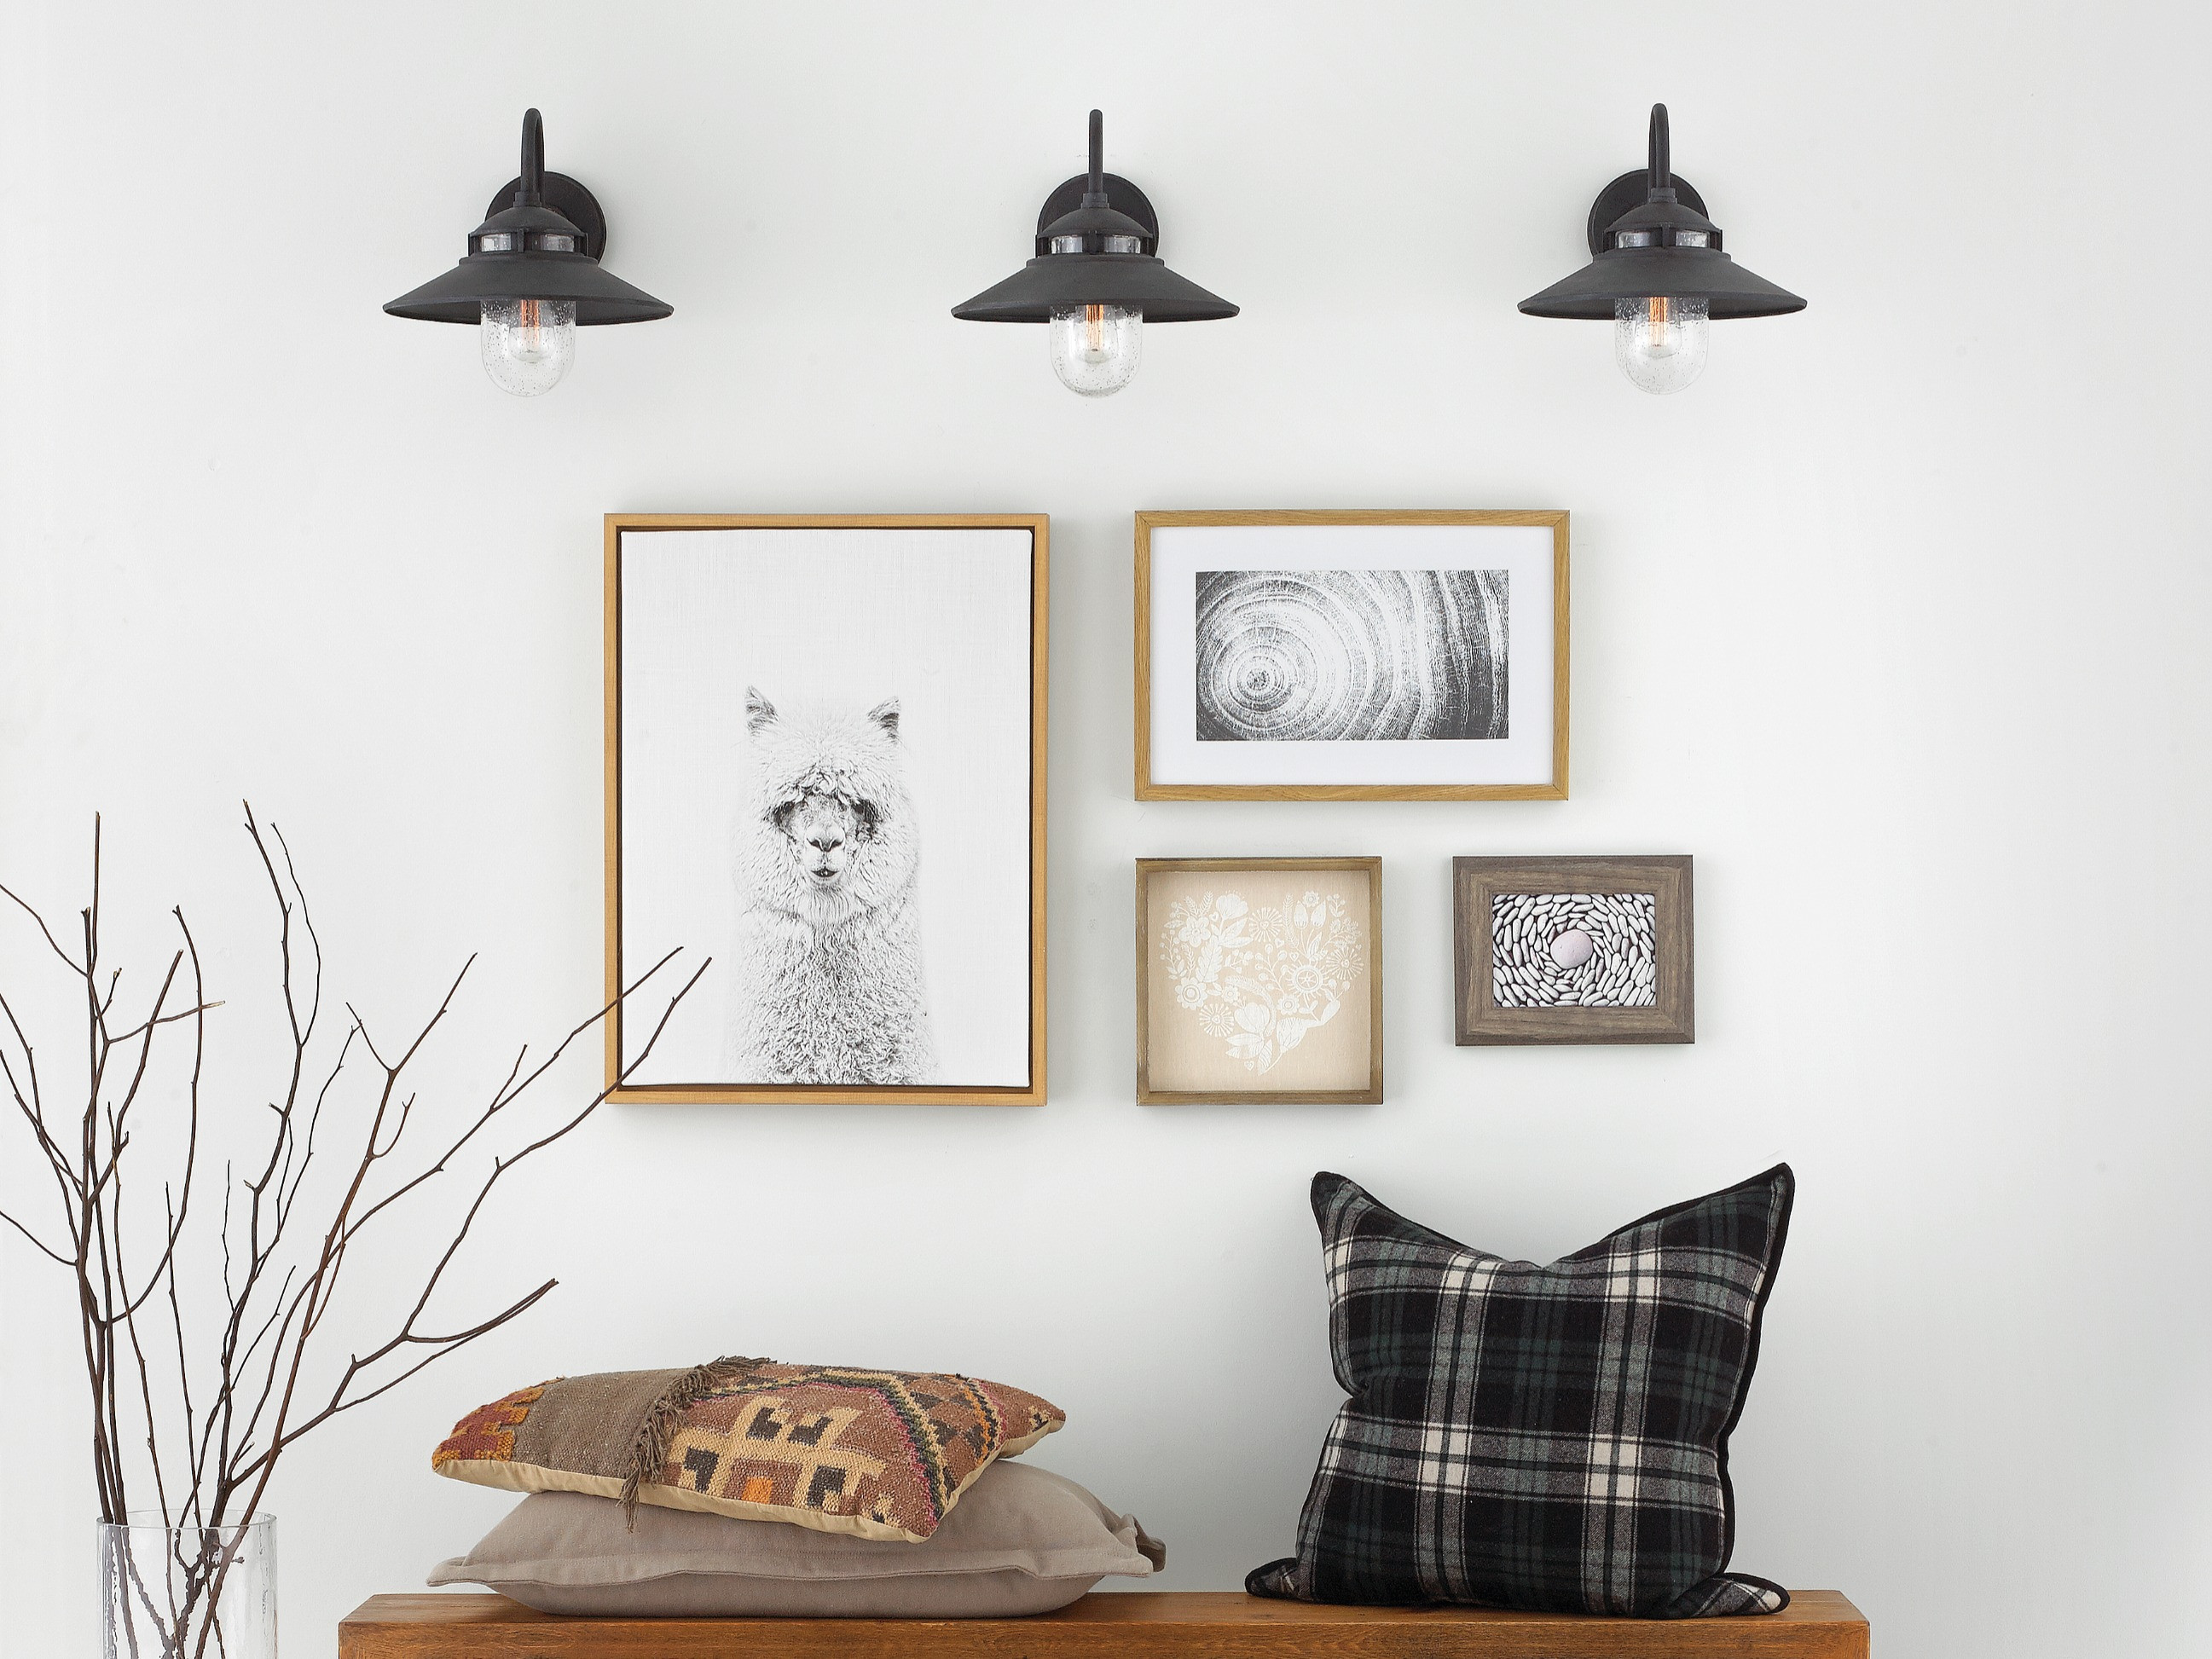 On Site Lighting/Fan Design Consultation